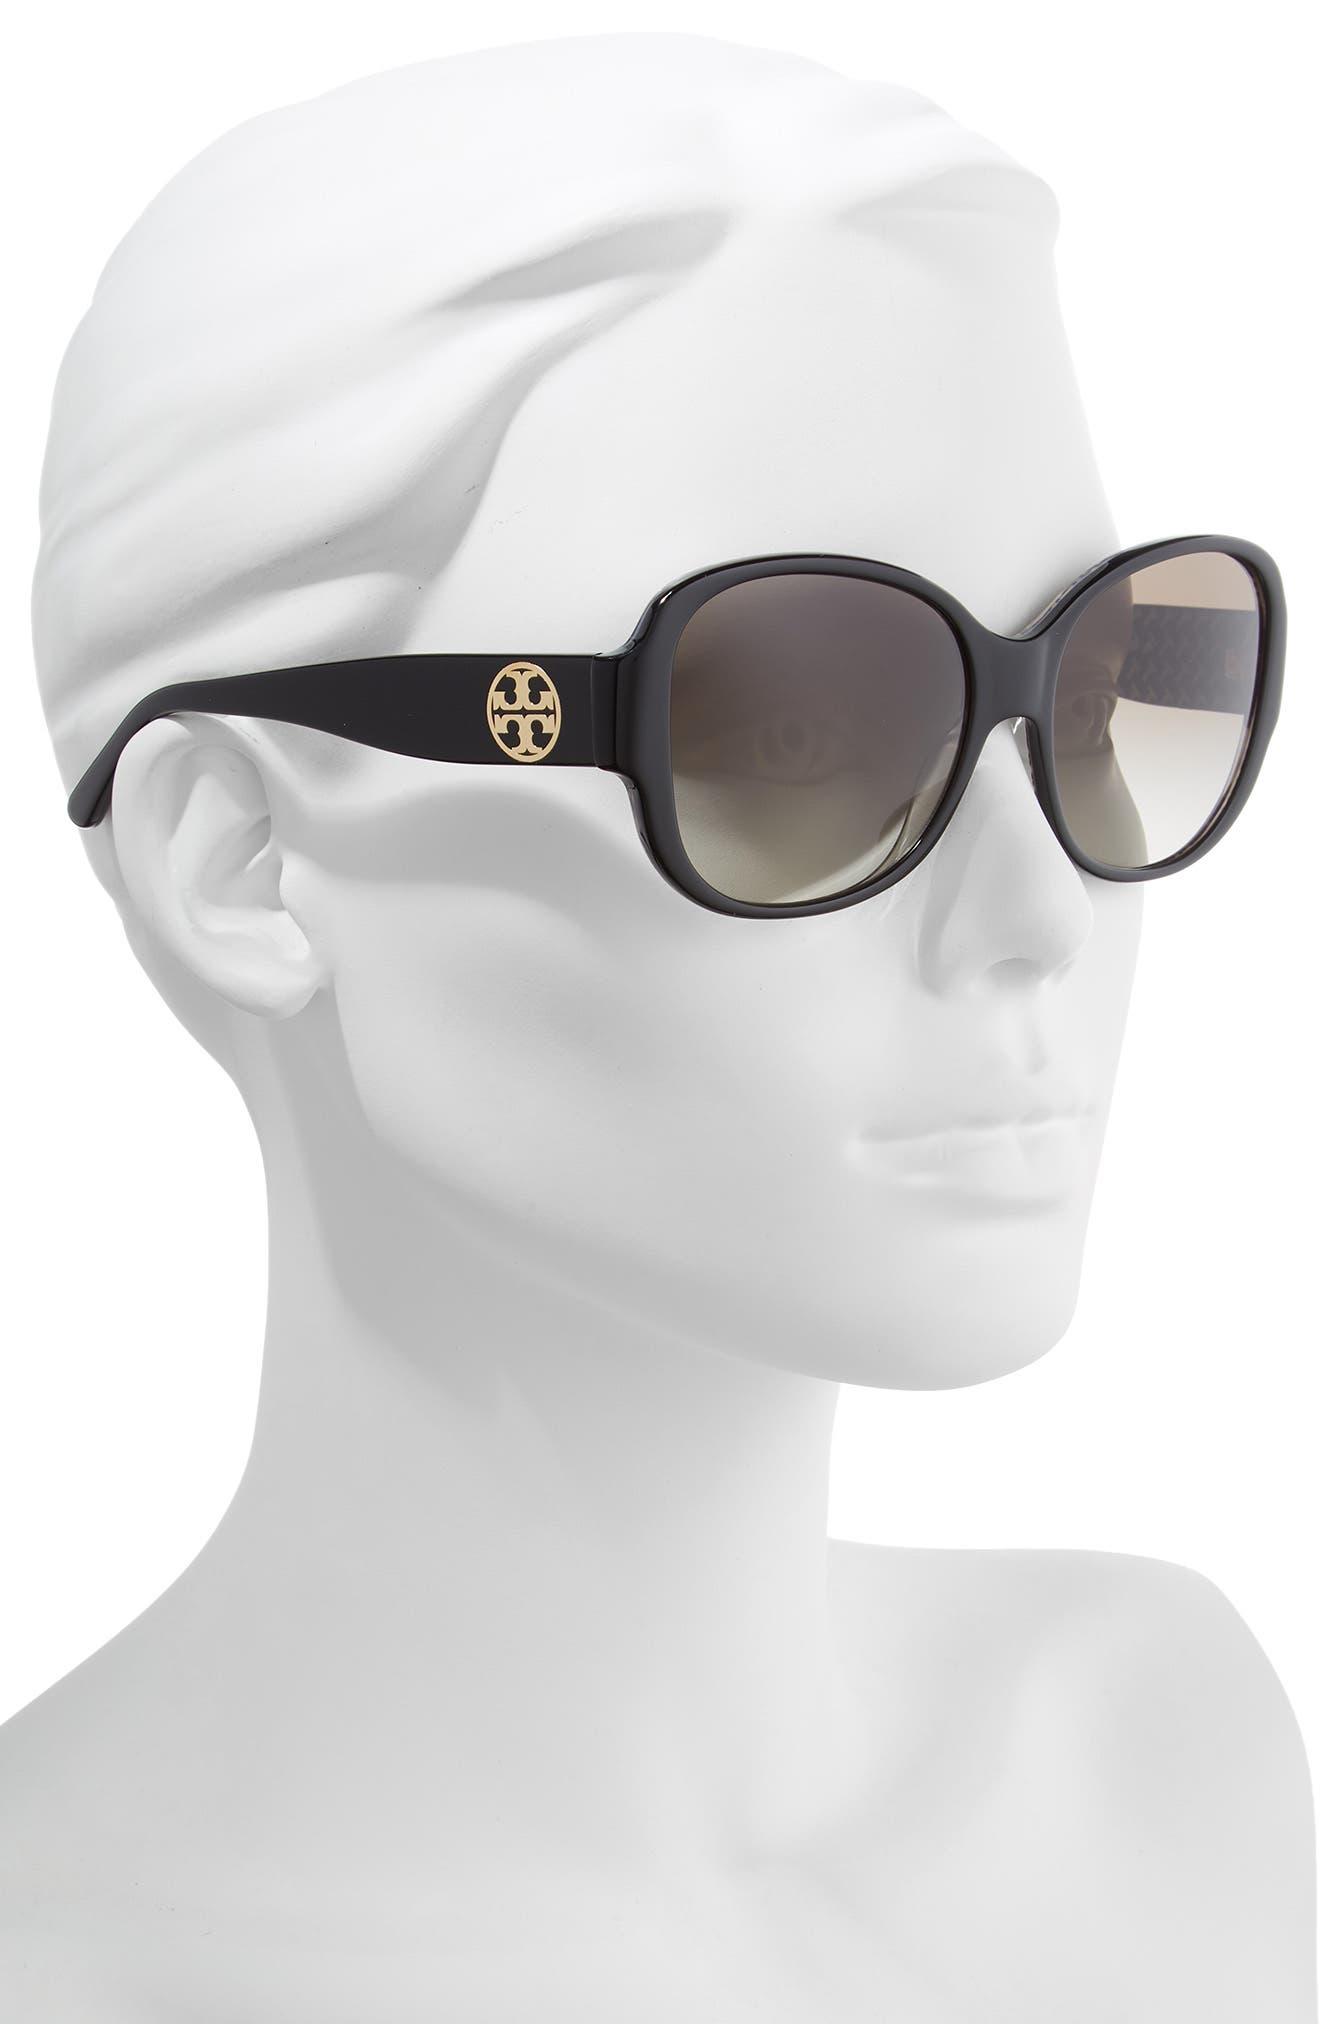 56mm Gradient Retro Sunglasses,                             Alternate thumbnail 2, color,                             009